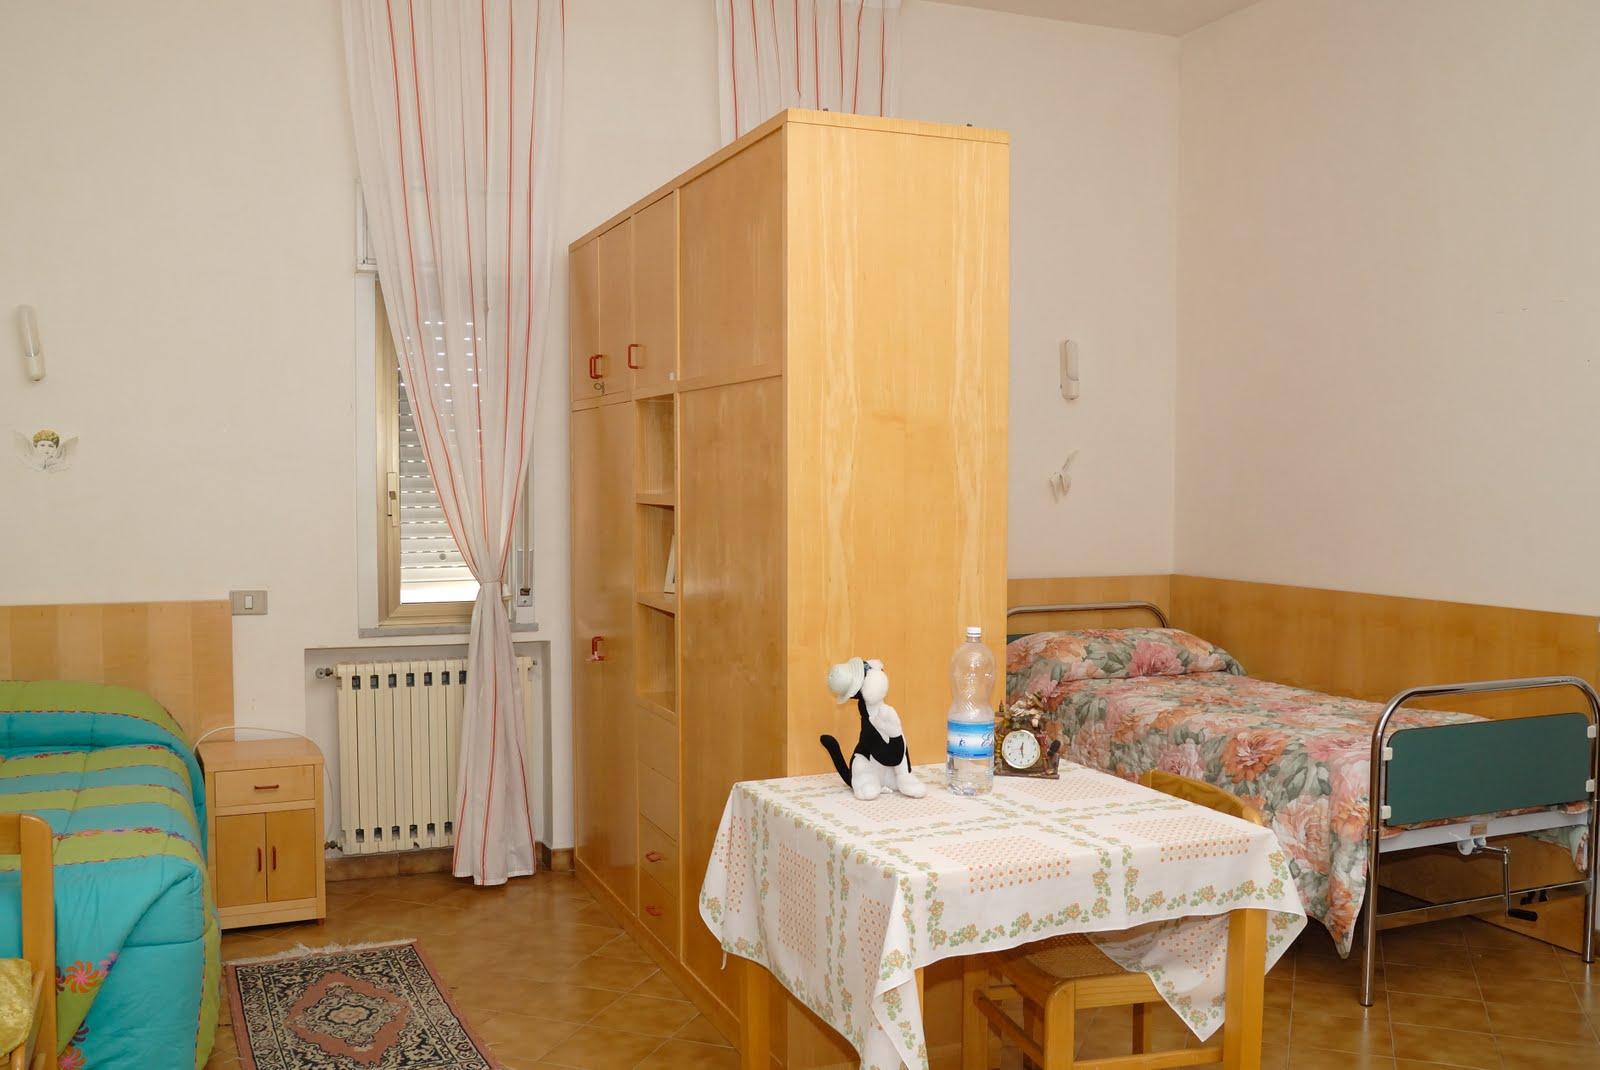 casa di riposo san gaetano salemi tariffe